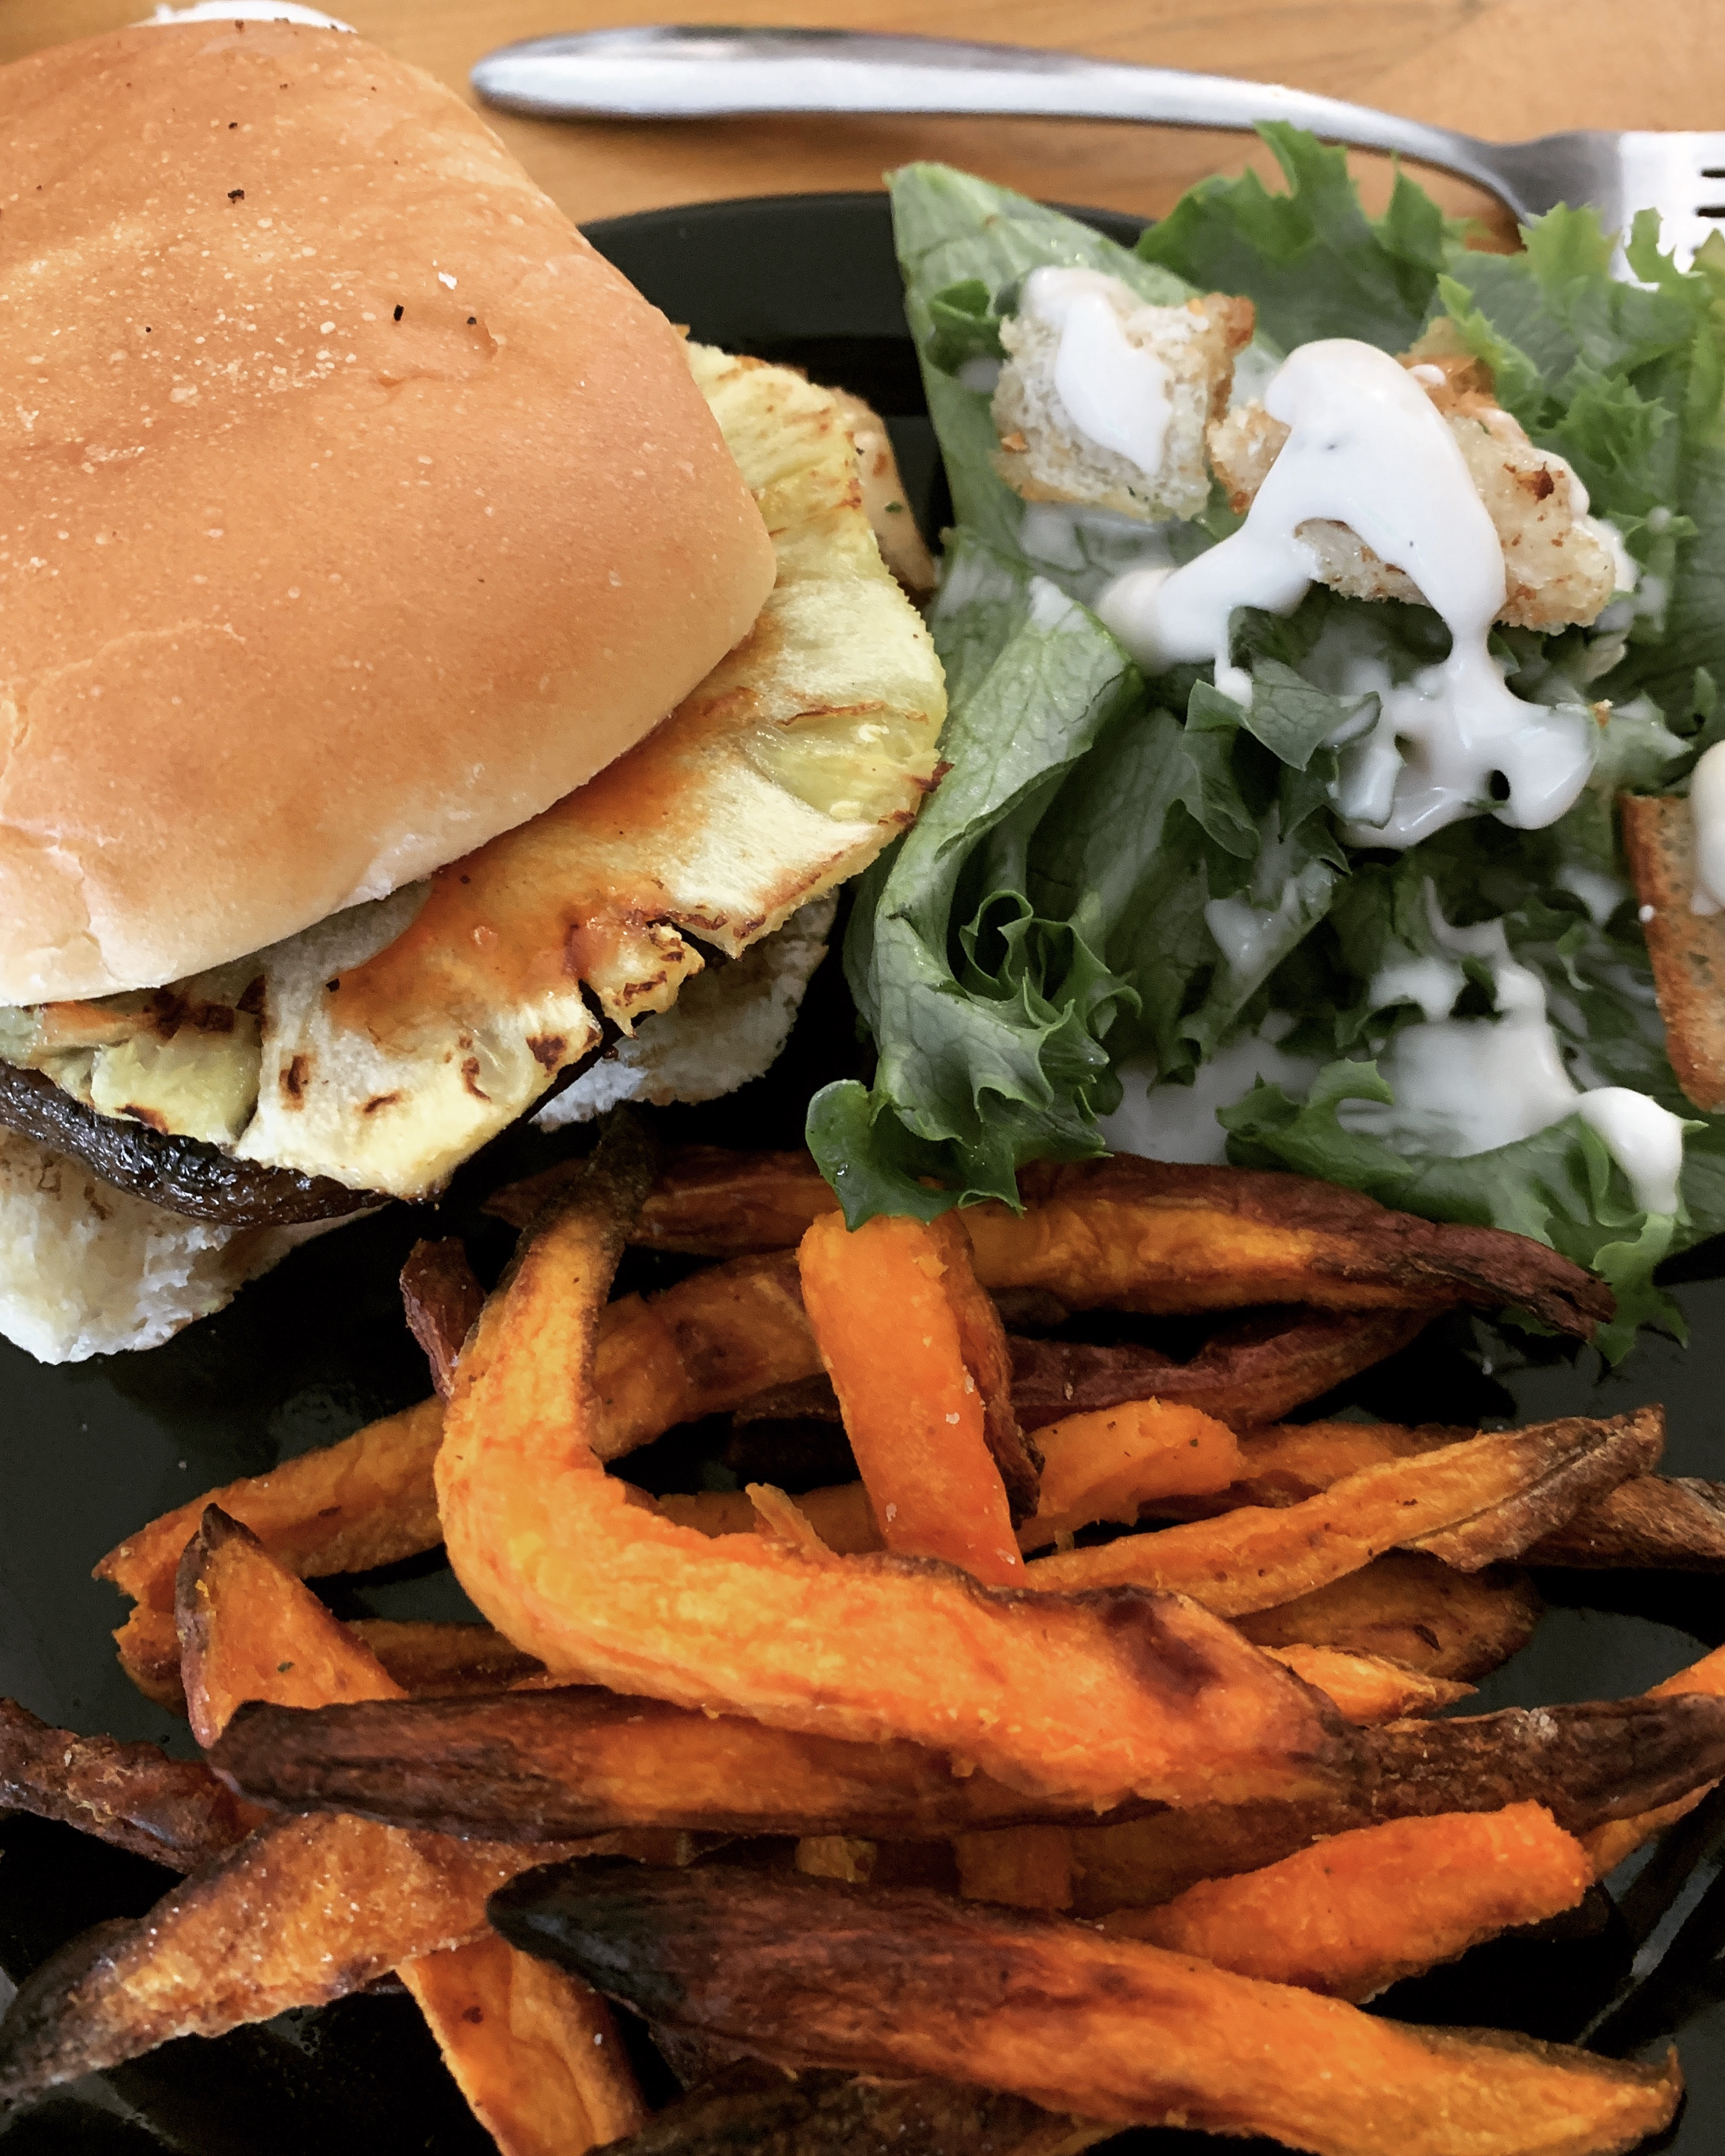 Vegan Mushroom Burger with sweet potato fries and vegan caesar salads